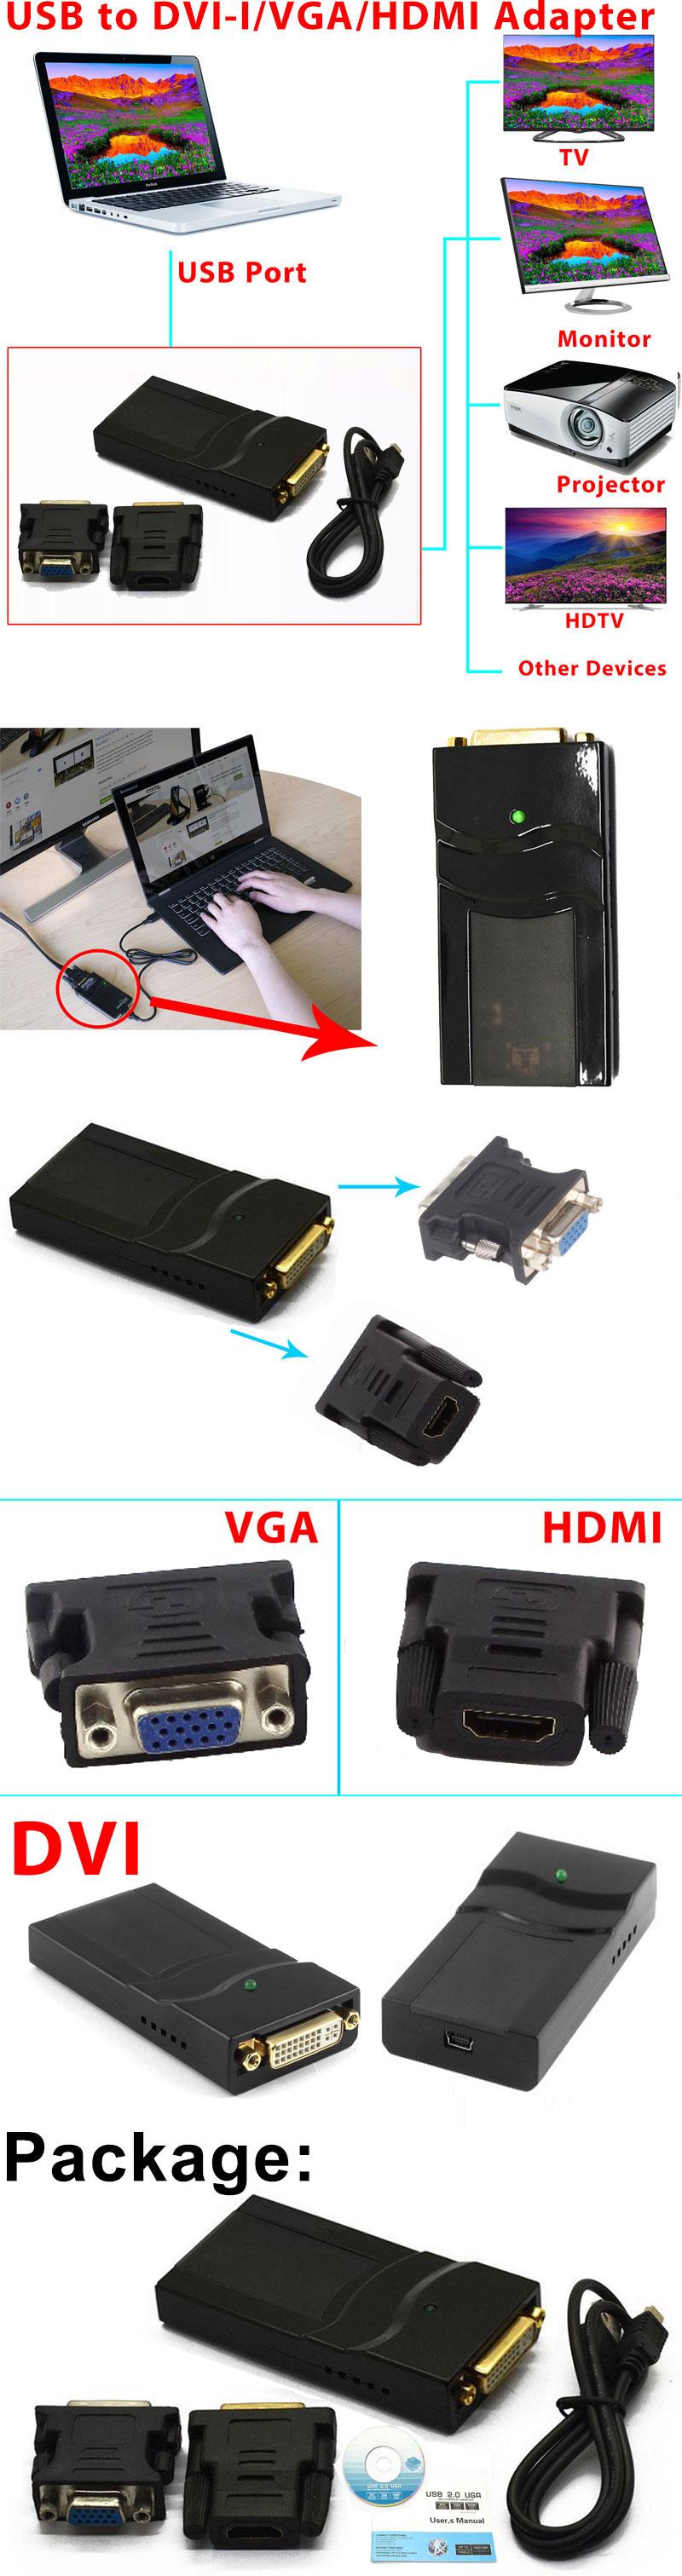 External Video Card USB to DVI VGA HDMI Display Adapter